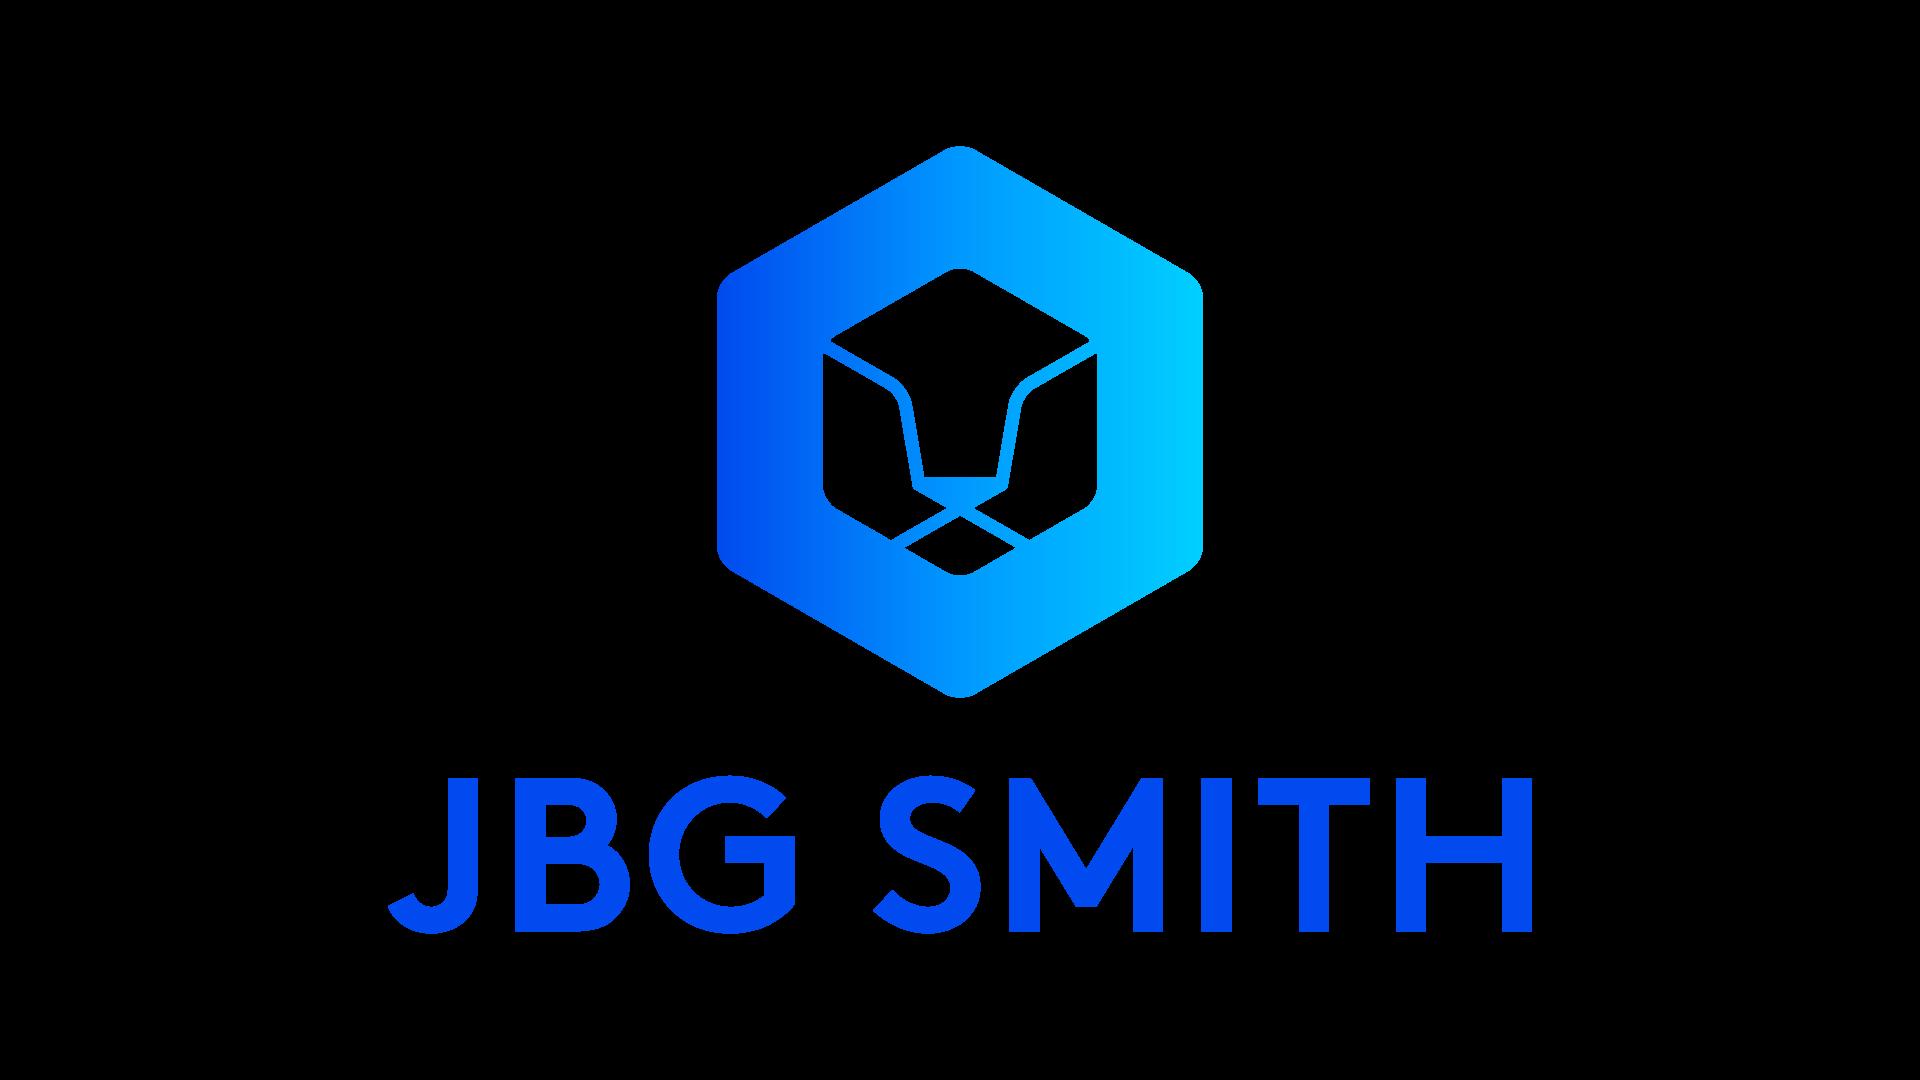 JBGS_WEB_1920.png